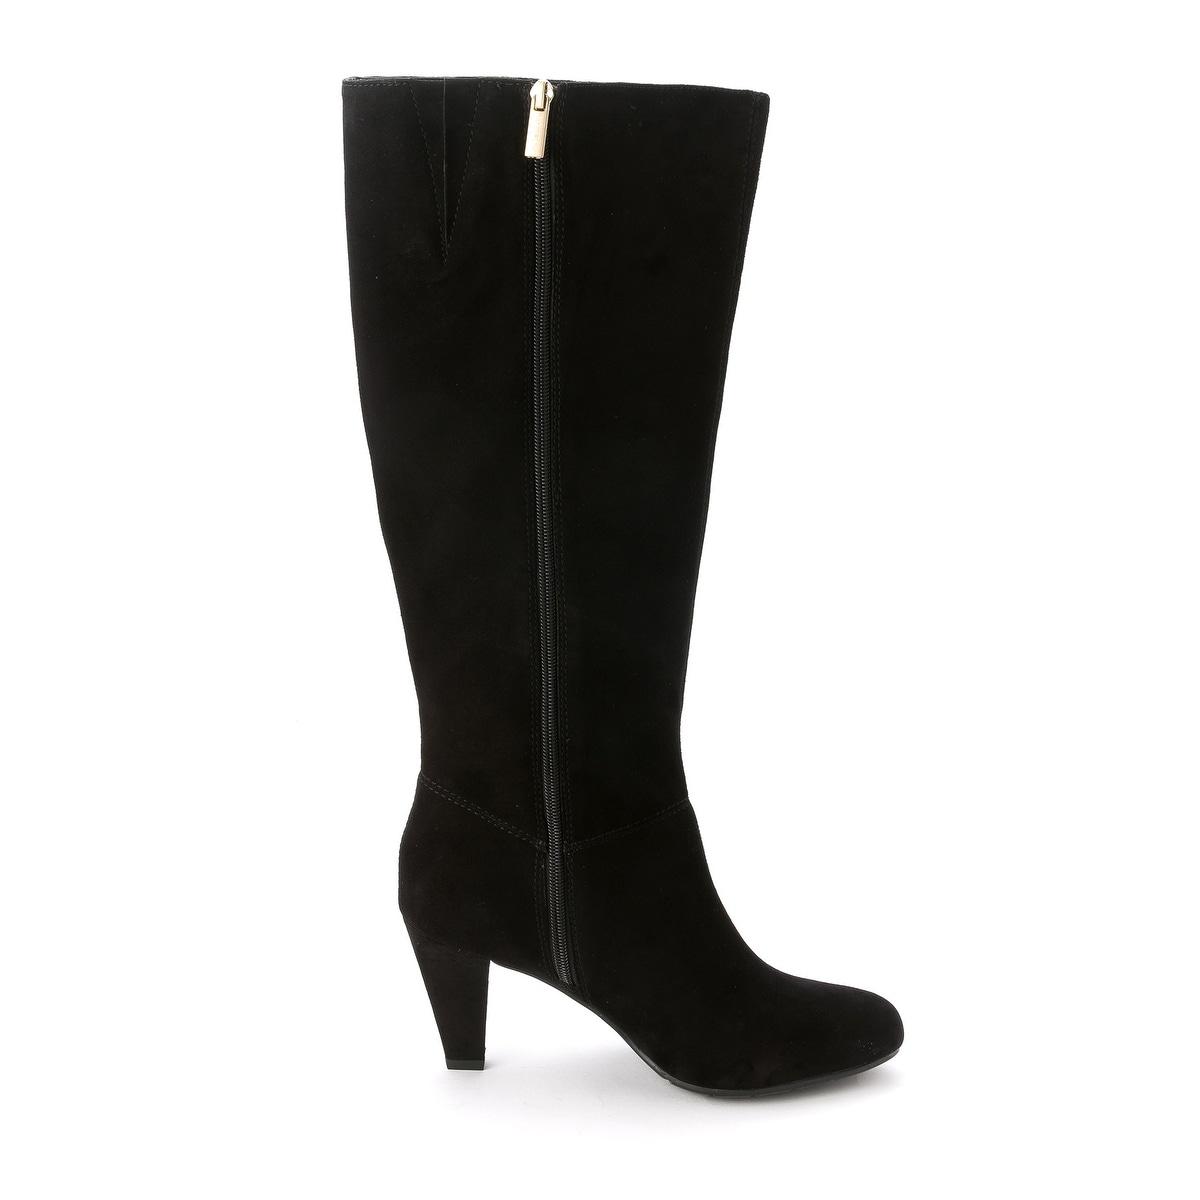 fd637dca0e3 Bandolino Womens BACIA Suede Round Toe Mid-Calf Riding Boots